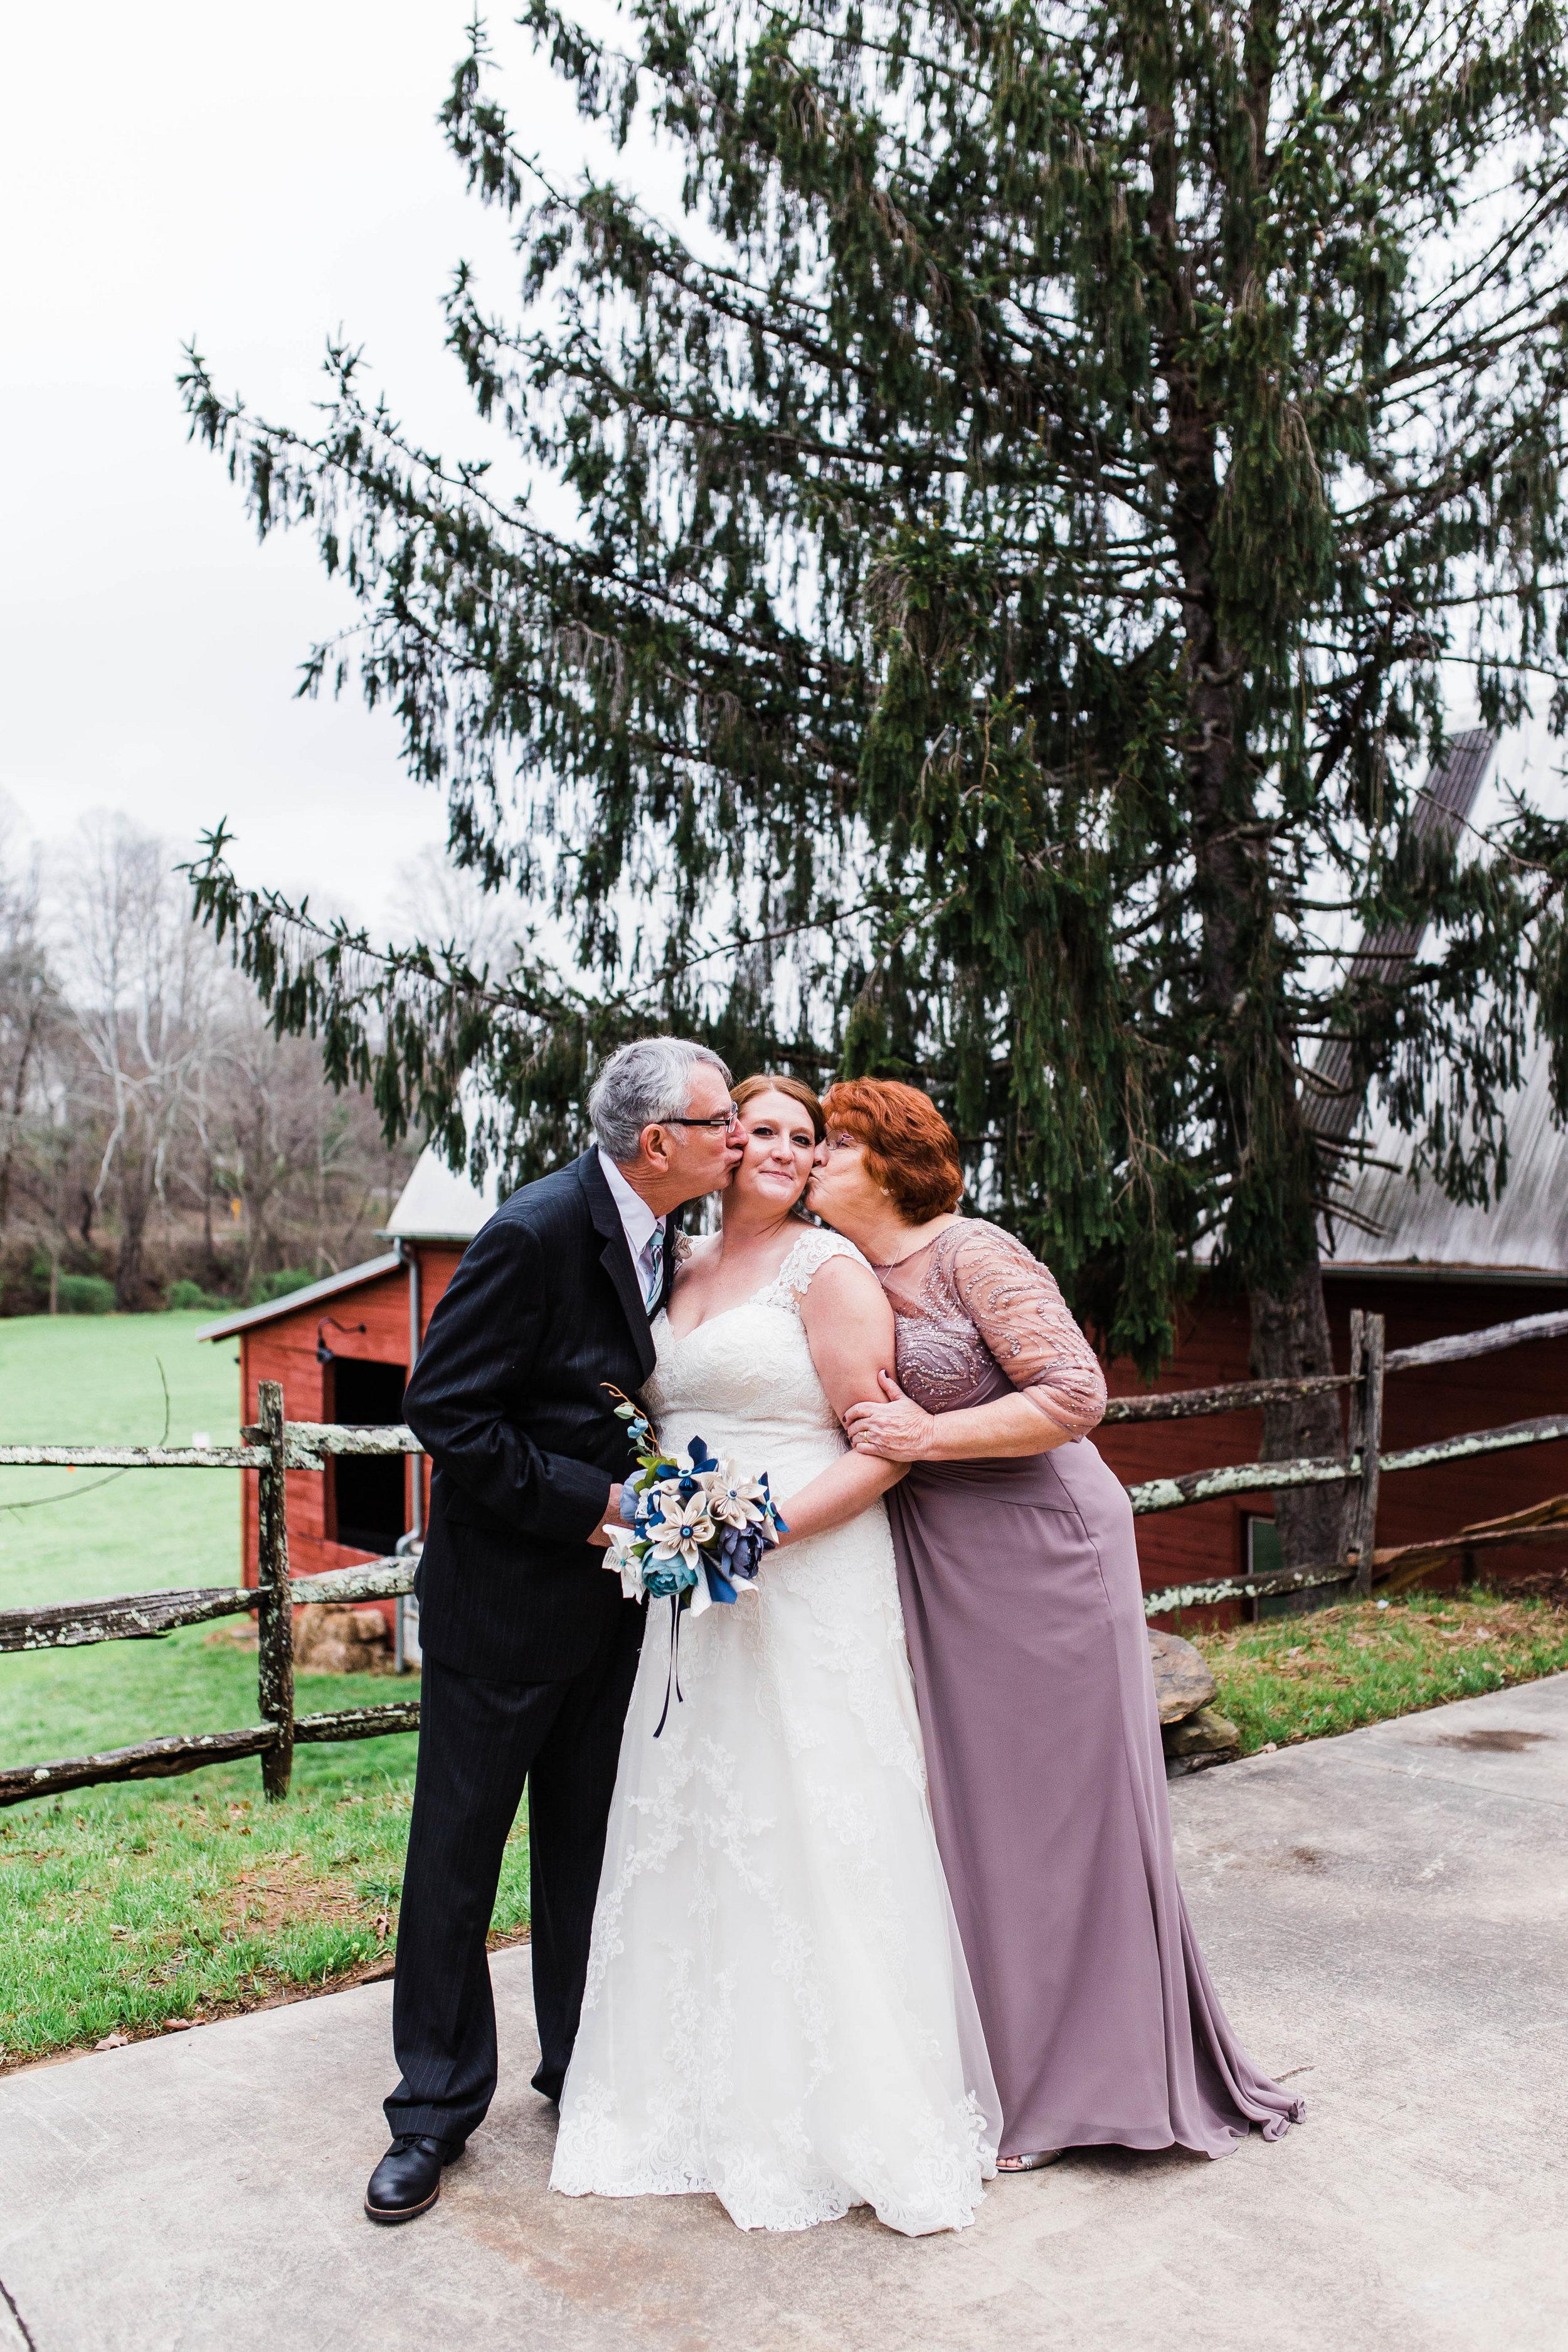 Honeysuckle-Hill-Weddings-Andrew-Rachel-59.jpg